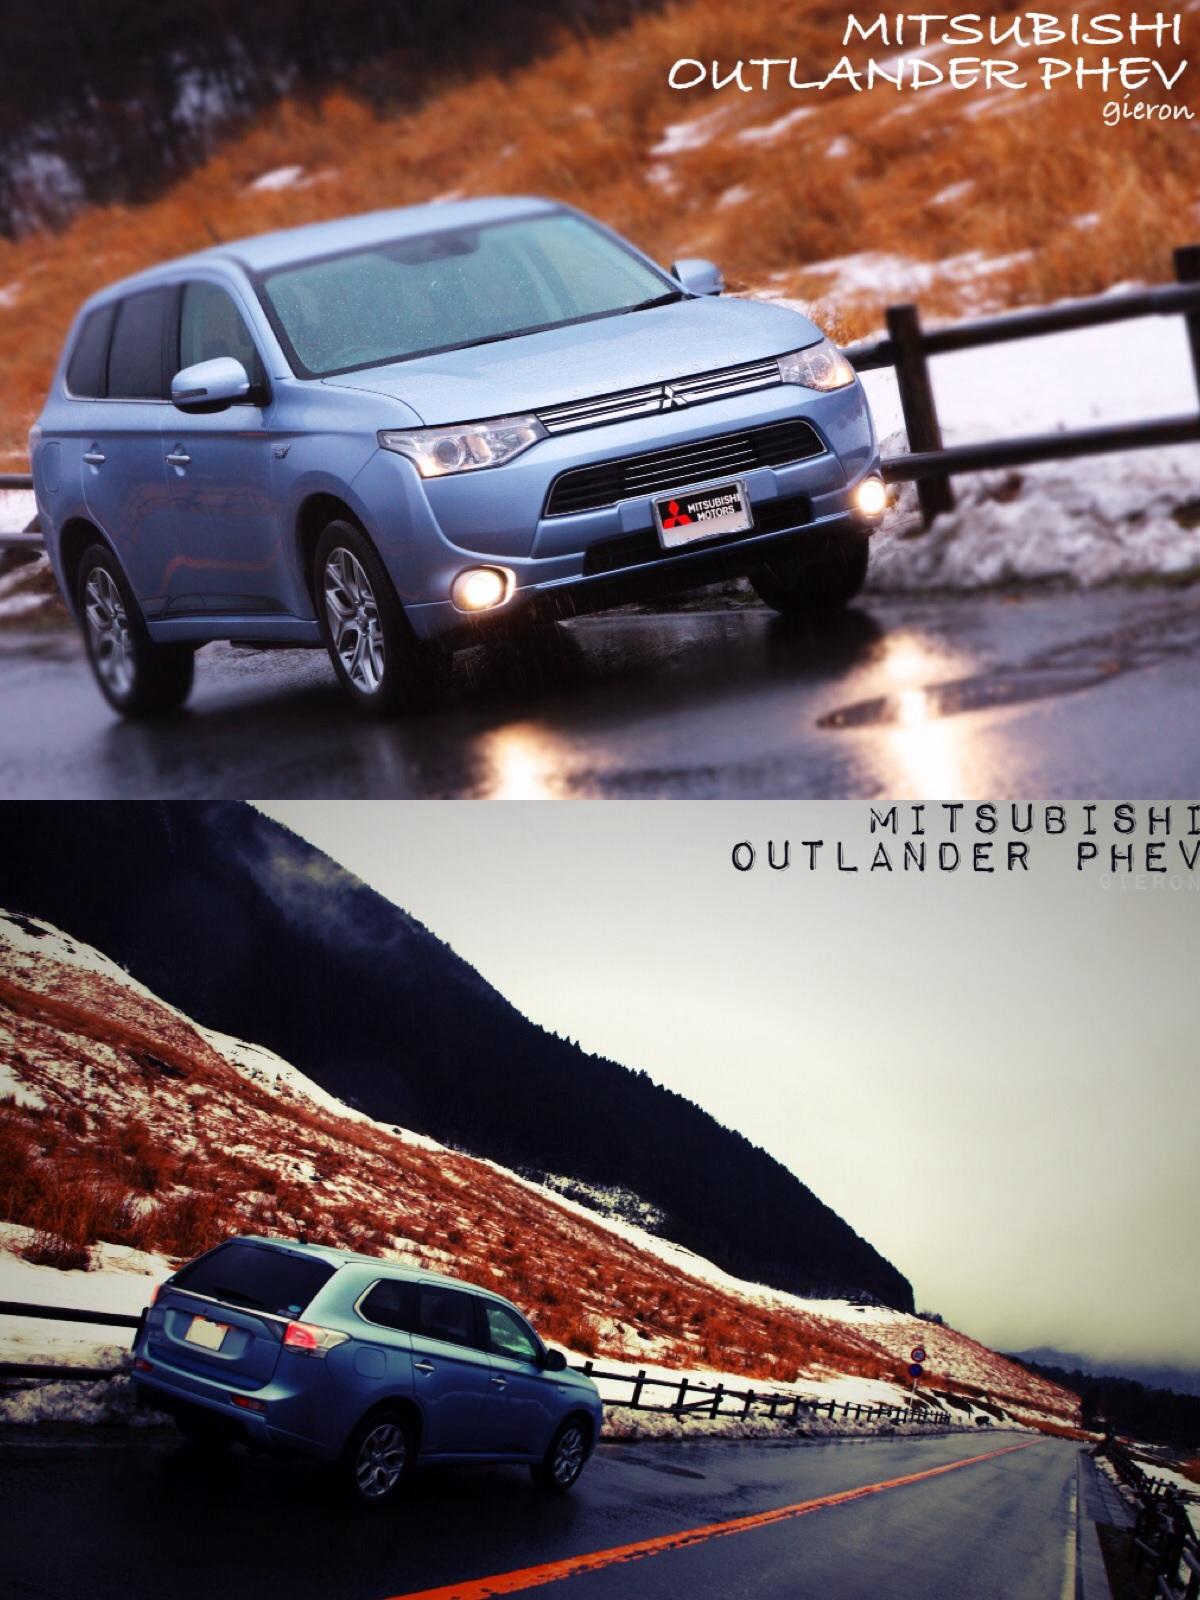 Mitsubishi outlander phev japan